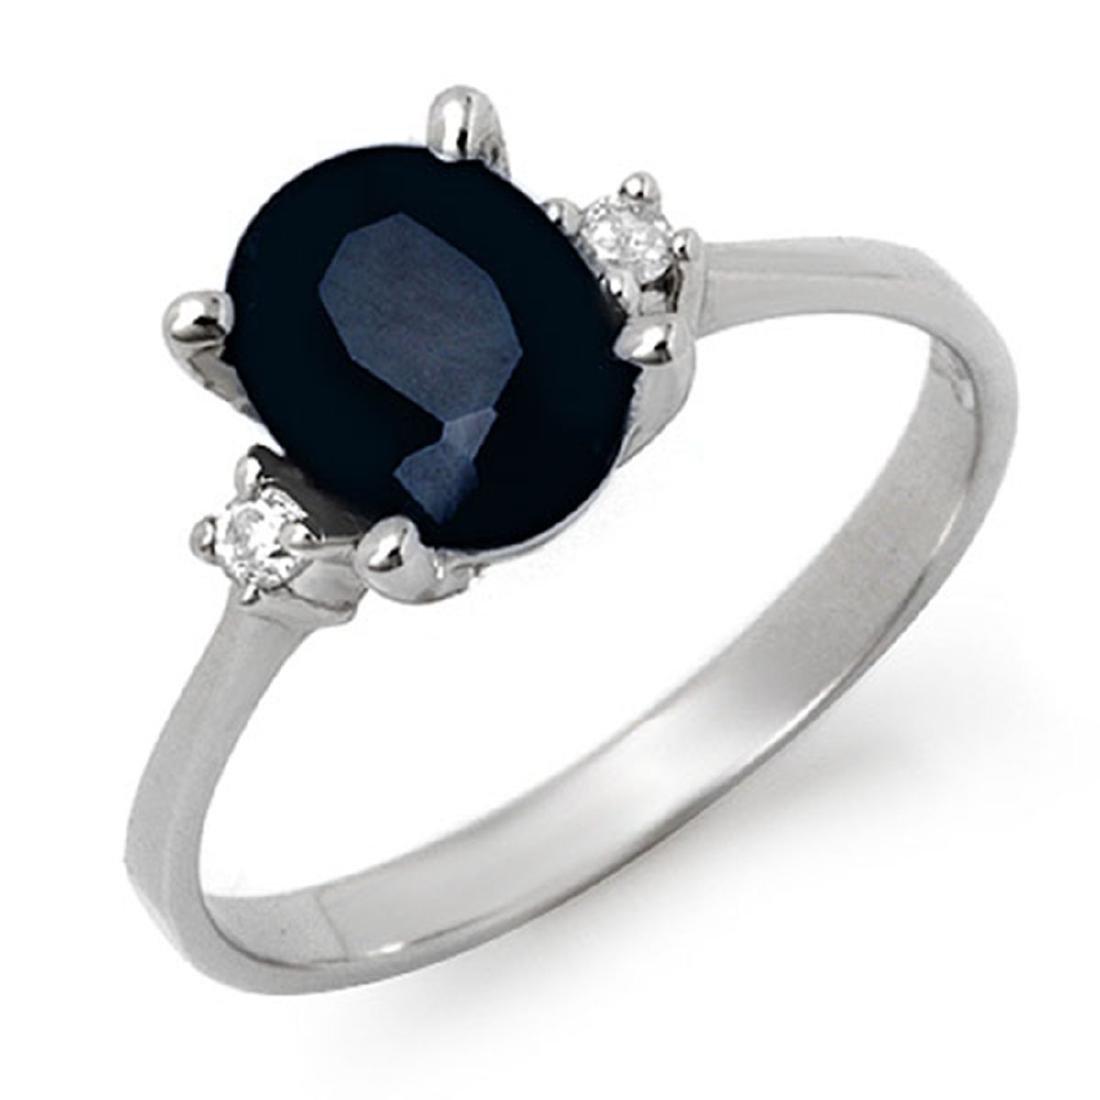 2.33 CTW Genuine Blue Sapphire & Diamond Ring 10K White